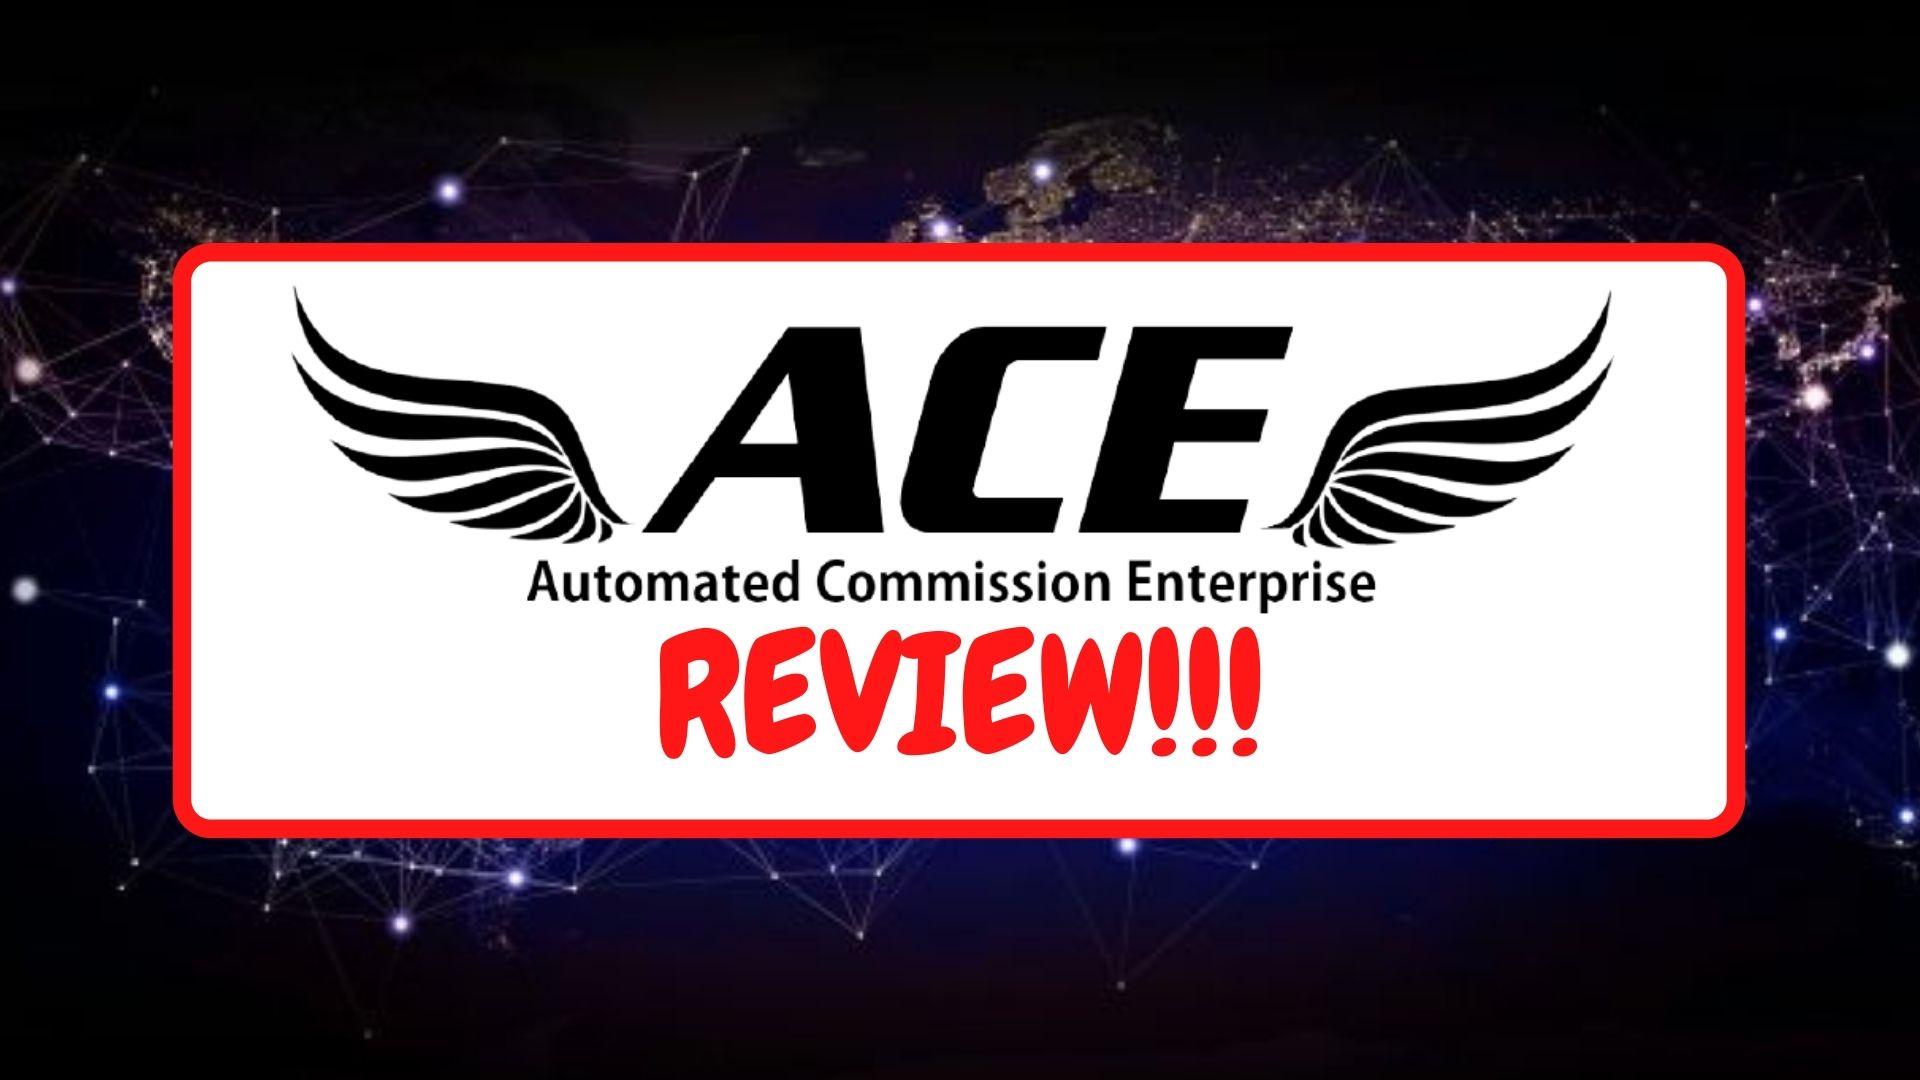 Automated Commission Enterprise Frontpage